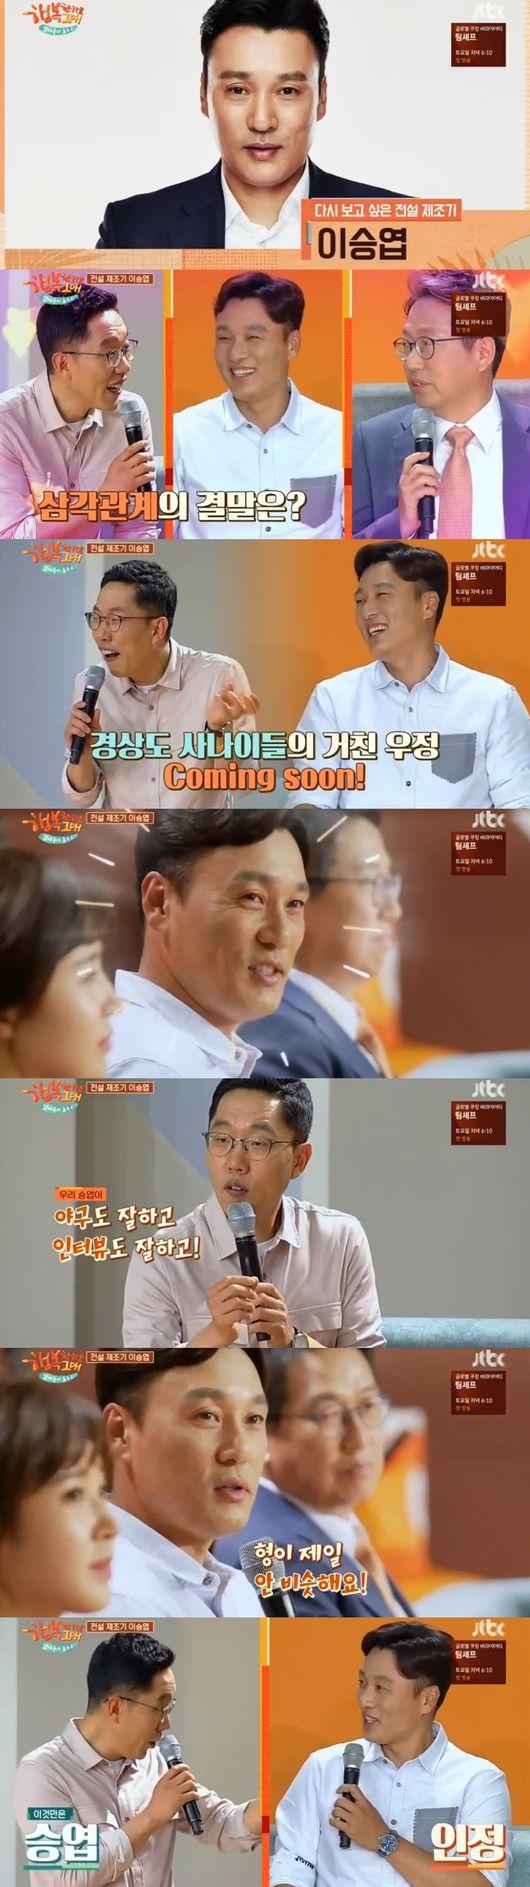 [Oh!쎈 리뷰]절친케미 톡투유2 이승엽X김제동, 경상도 사나이s 거친 우정